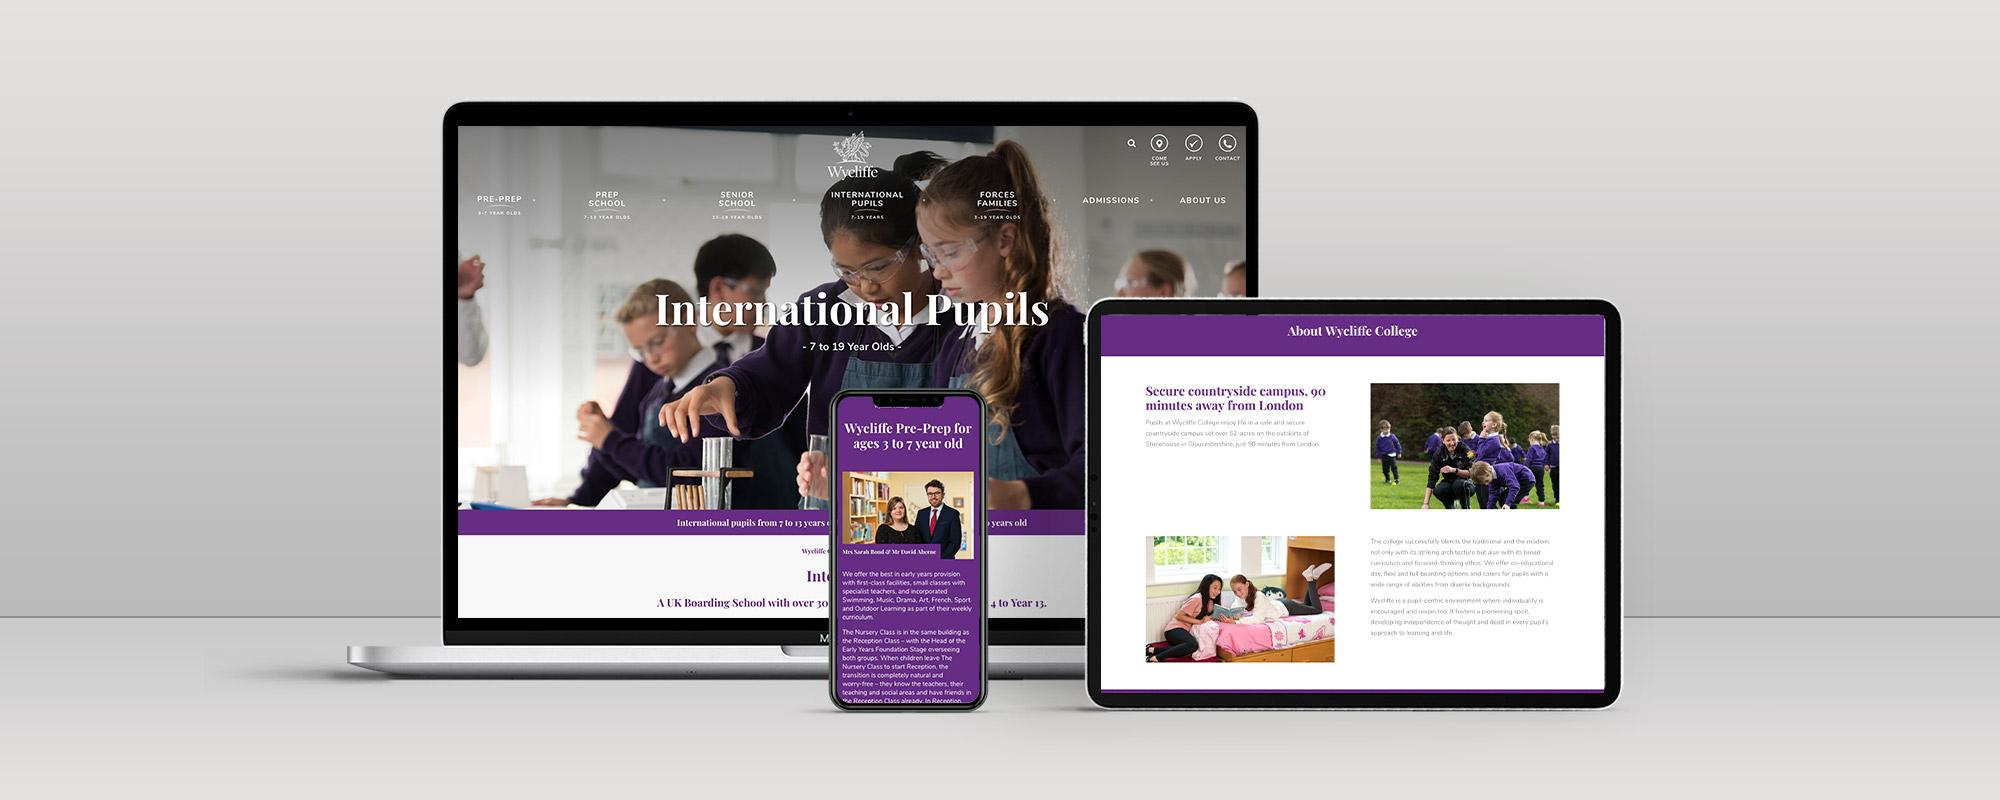 Wycliffe College Wordpress Website Design on 3 Devices